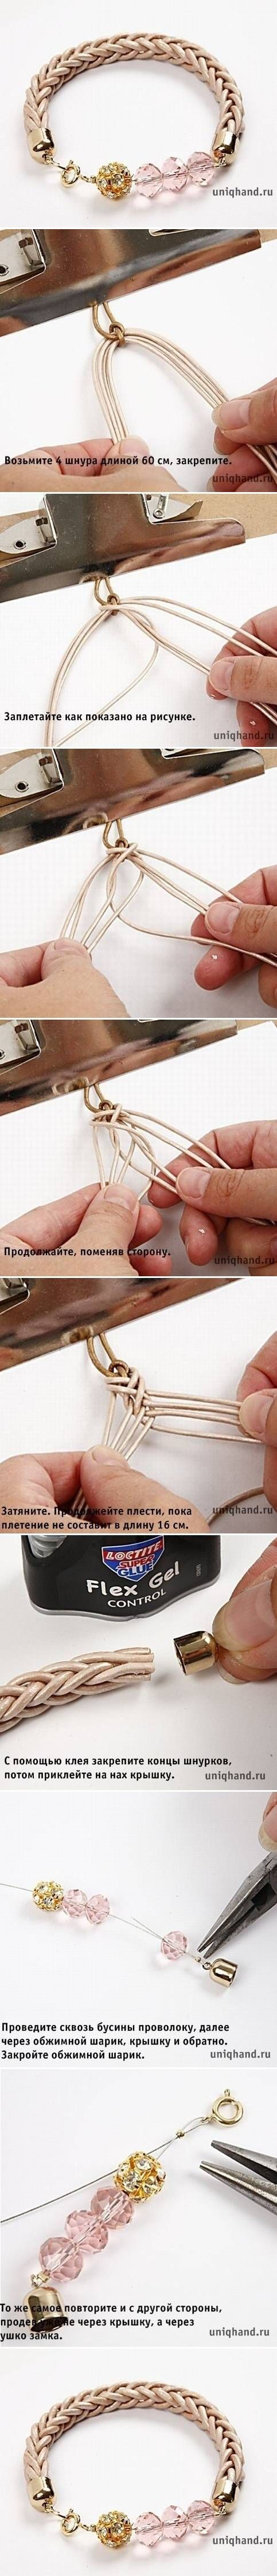 DIY Easy Simple Leather Bracelet DIY Projects / UsefulDIY.com